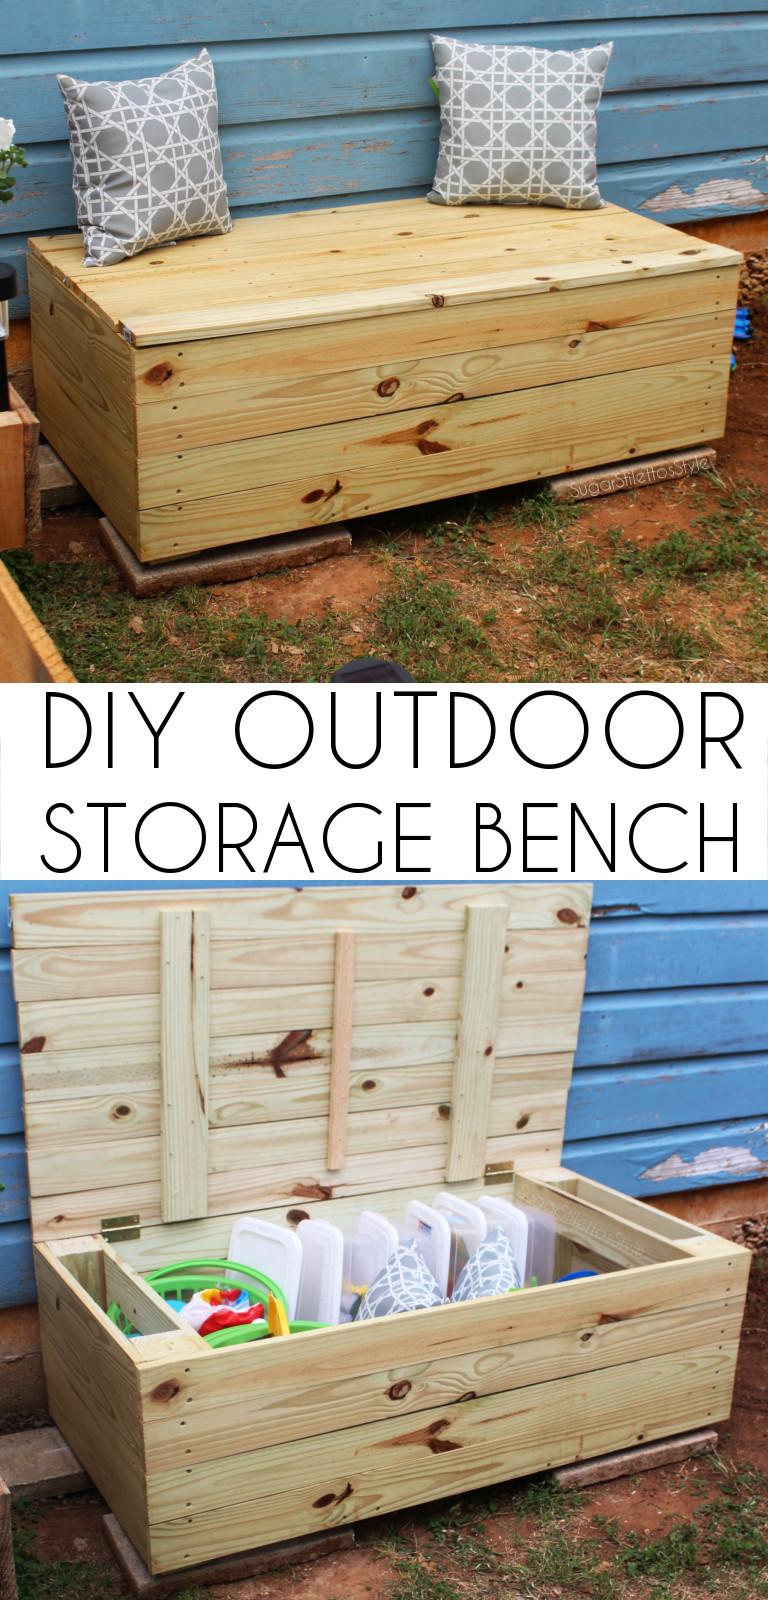 Best ideas about DIY Outdoor Storage Box . Save or Pin DIY Outdoor Storage Bench Shaina Glenn Now.